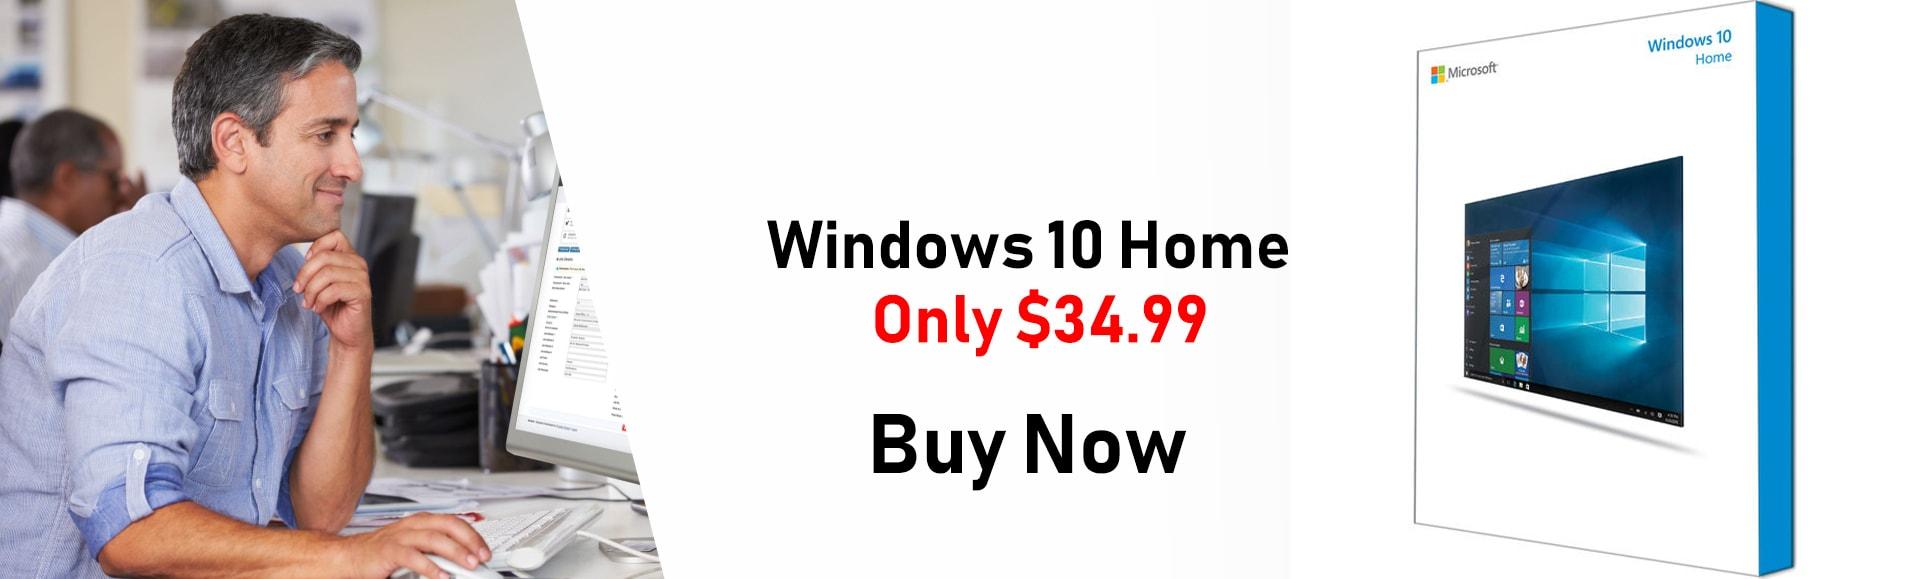 Windows10HomeSlider-min